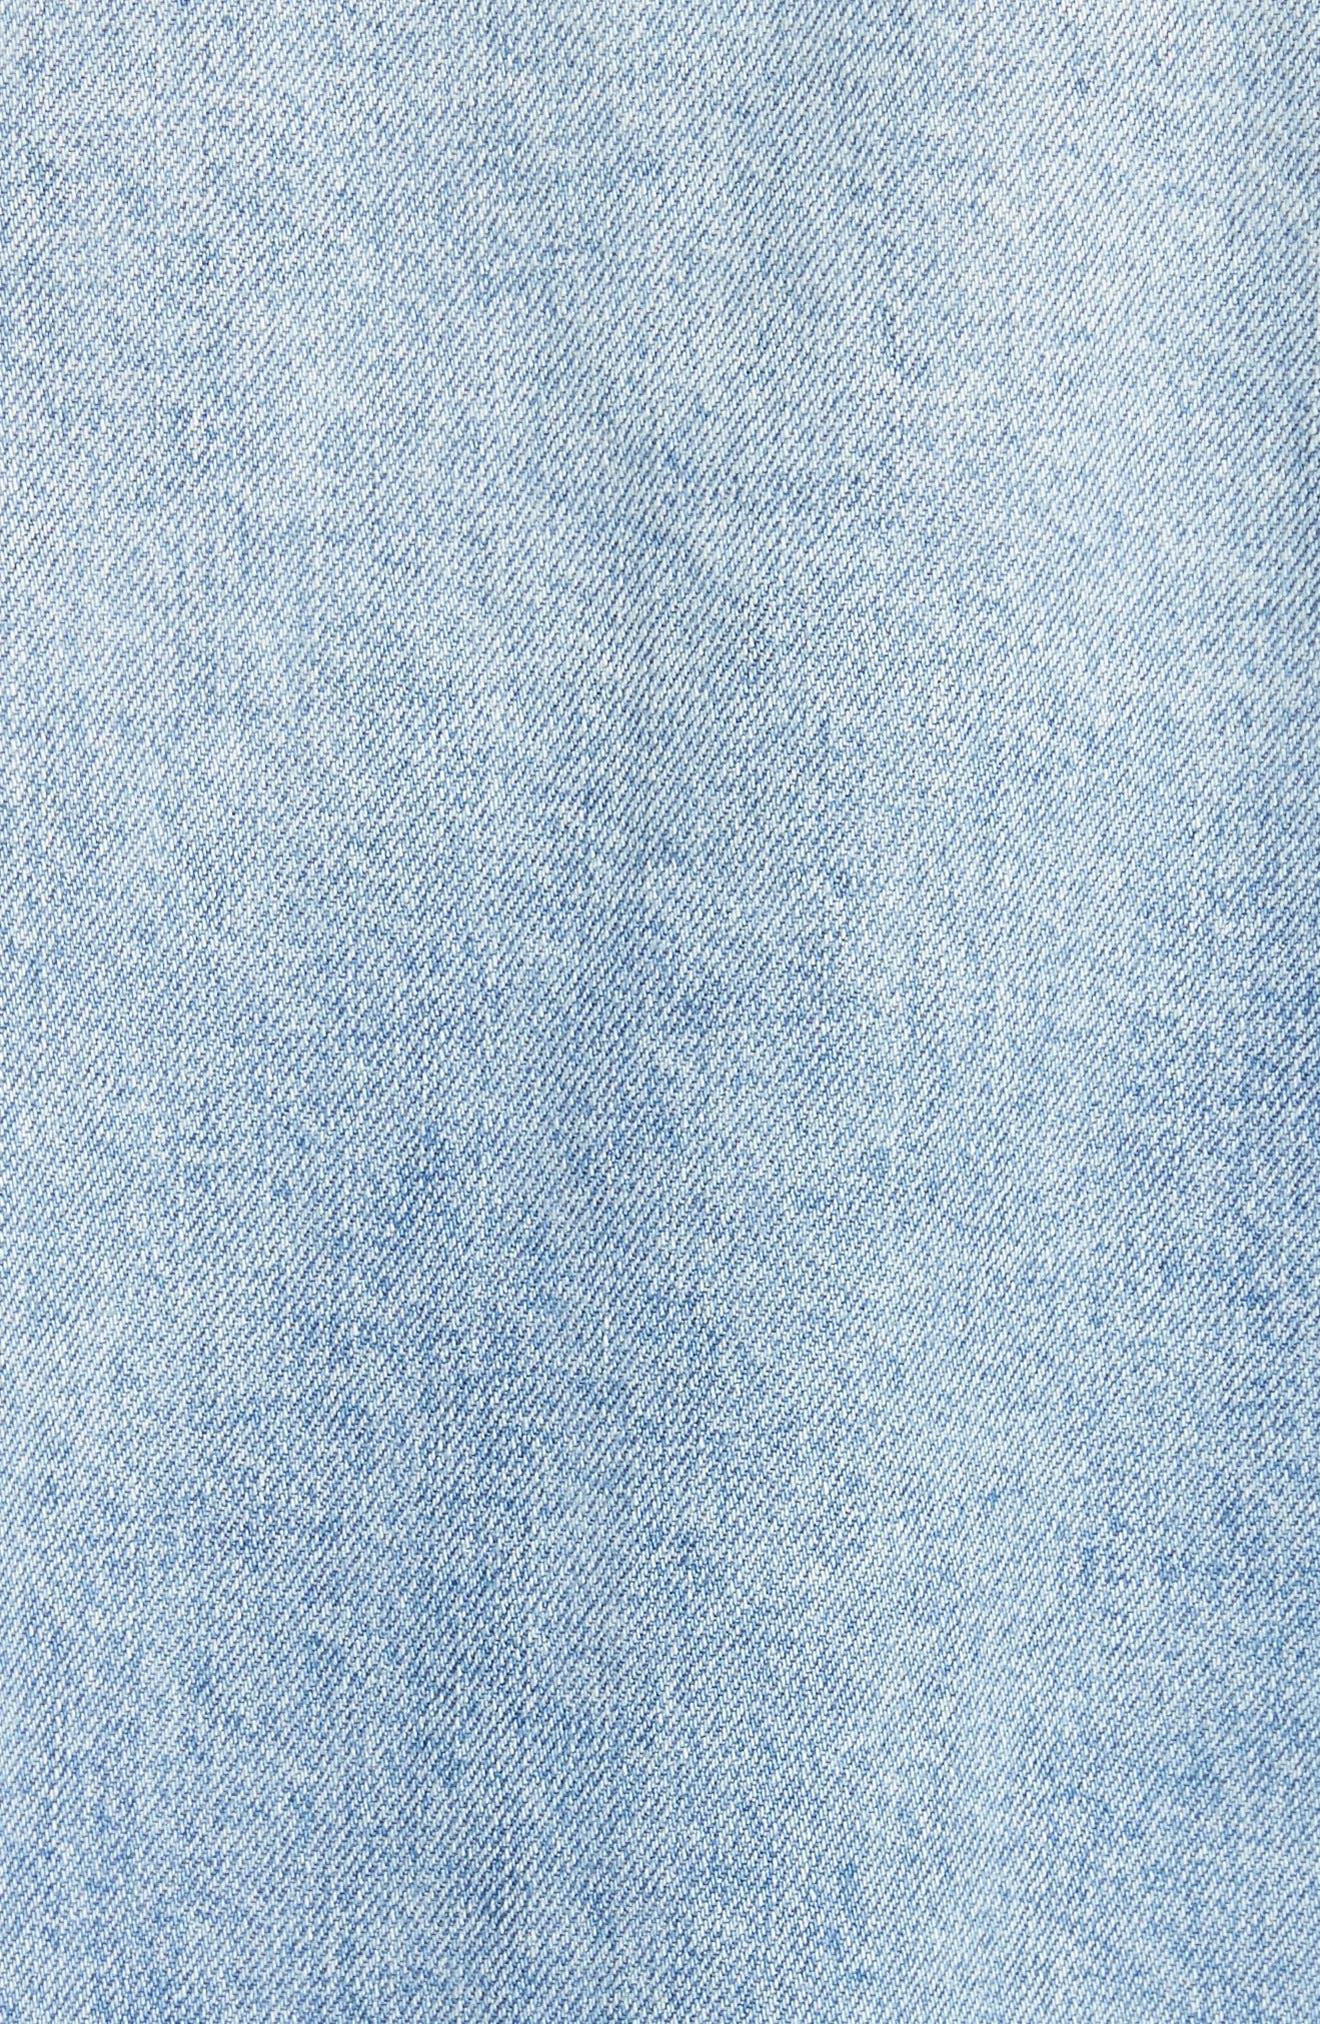 Hendrix Denim Jacket,                             Alternate thumbnail 5, color,                             Blue